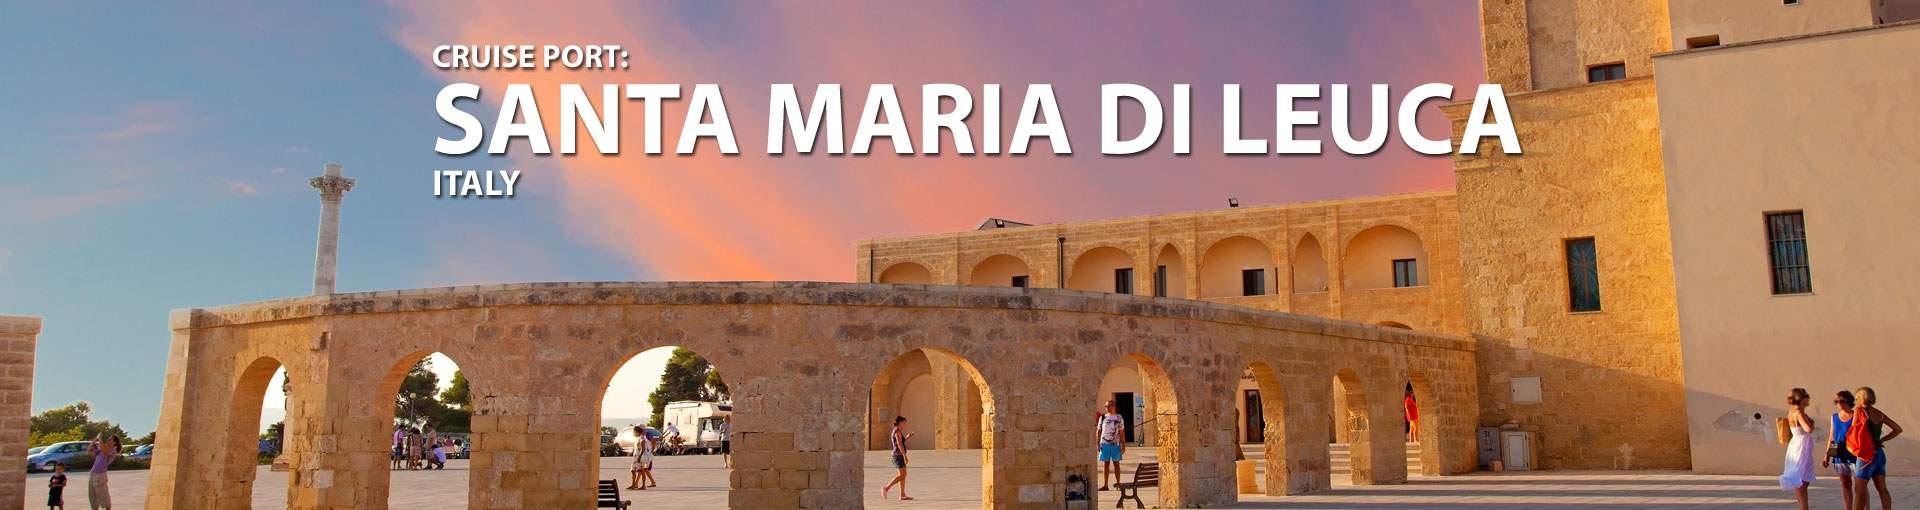 Cruises to Santa Maria Di Leuca, Italy